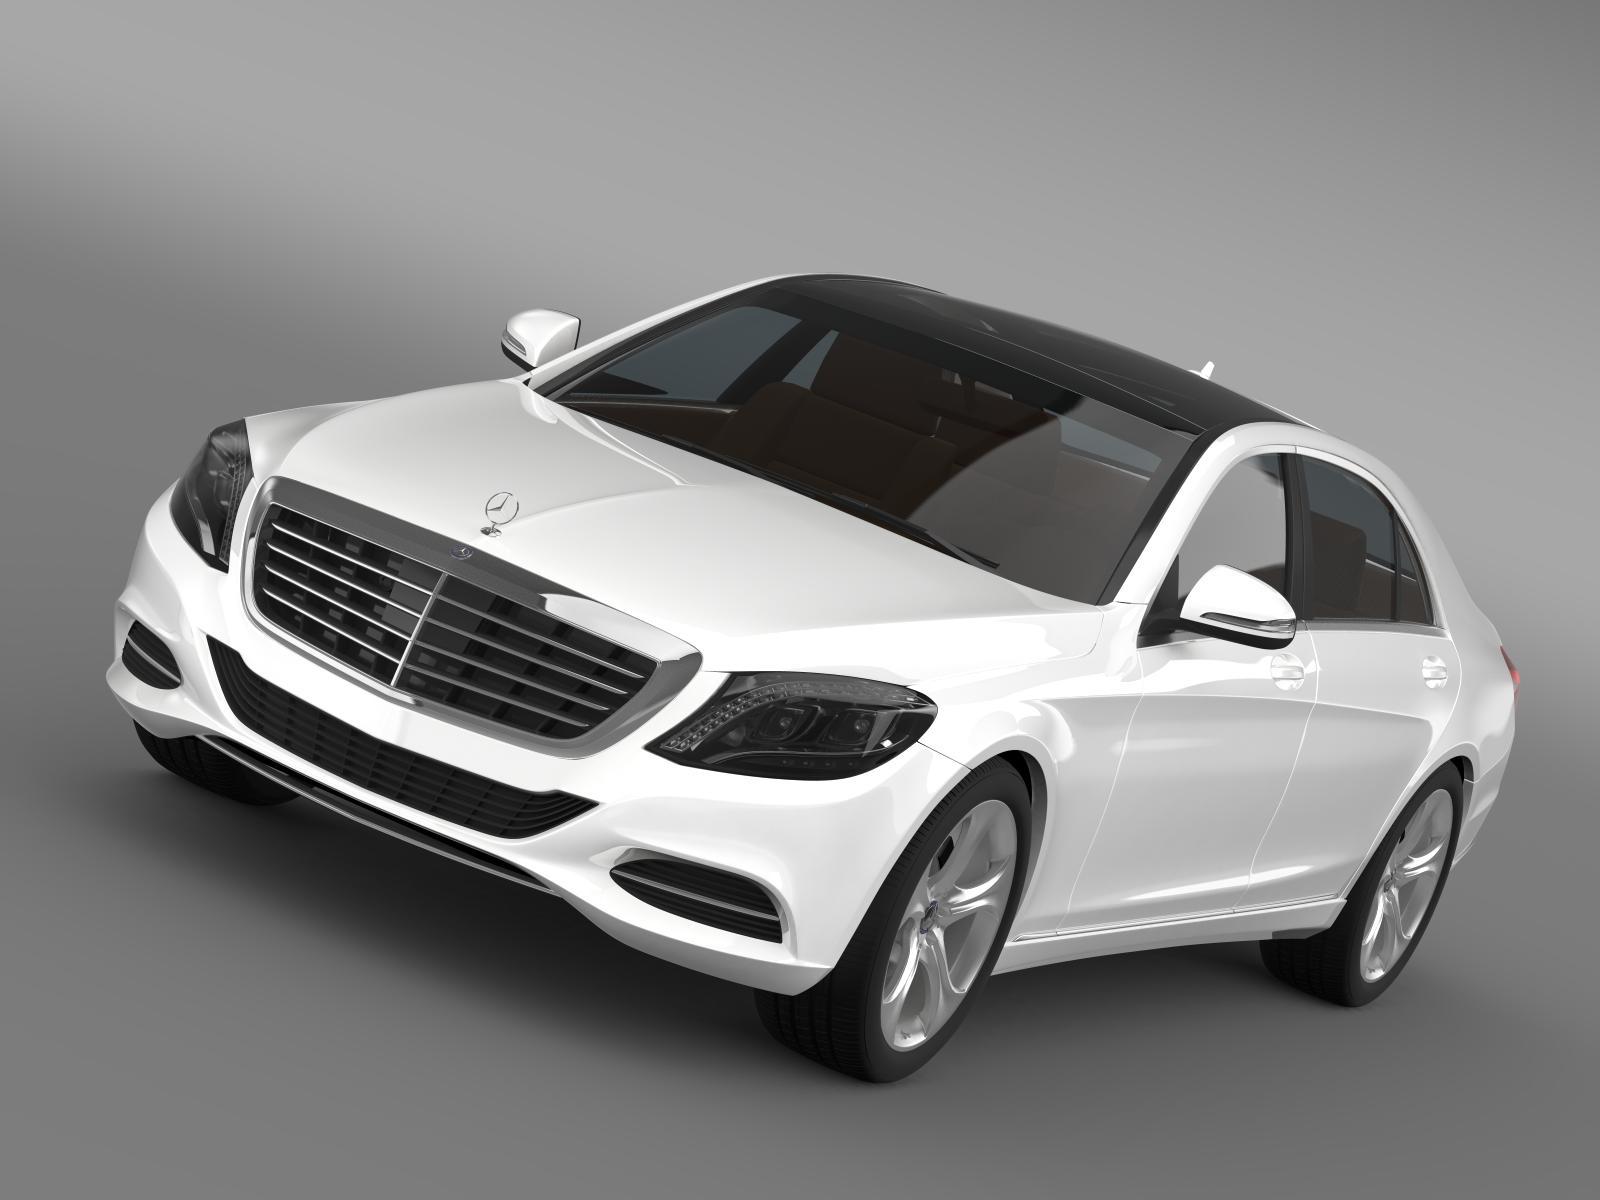 mercedes benz s 400 hybrid w222 2013 3d model 3ds max fbx c4d lwo ma mb hrc xsi 164187